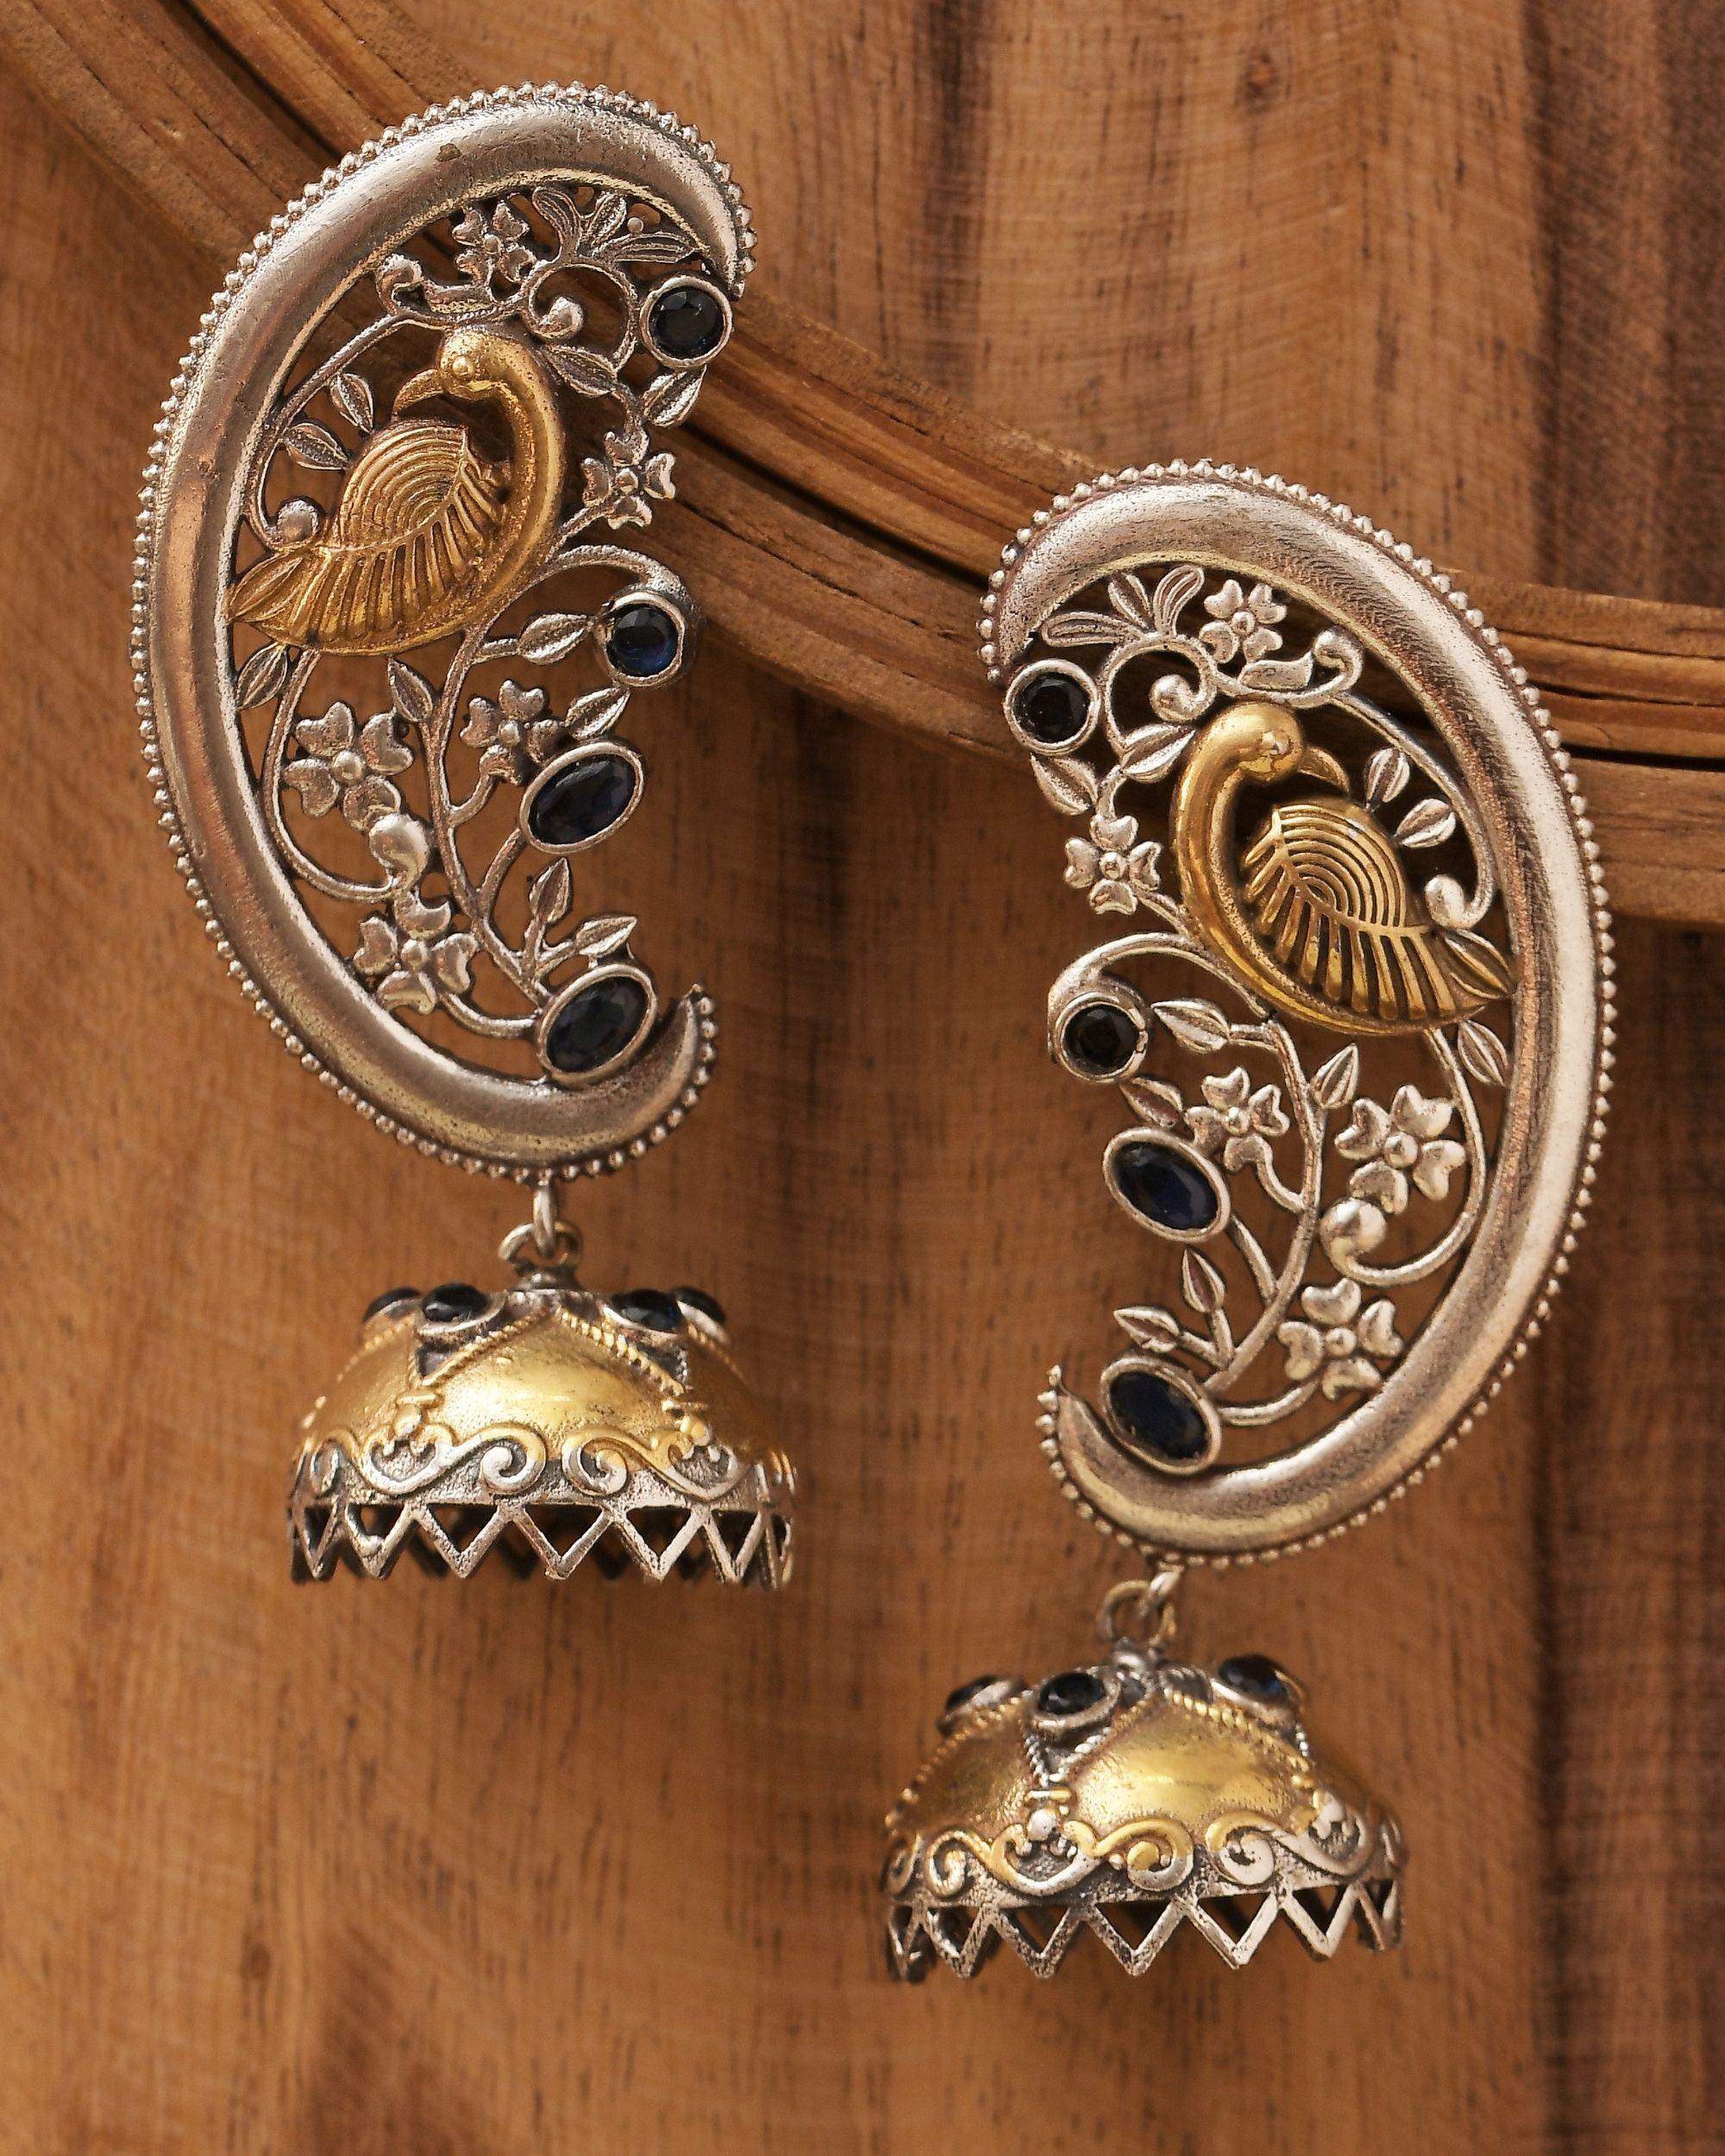 Dual toned peacock ear cuff with jhumka